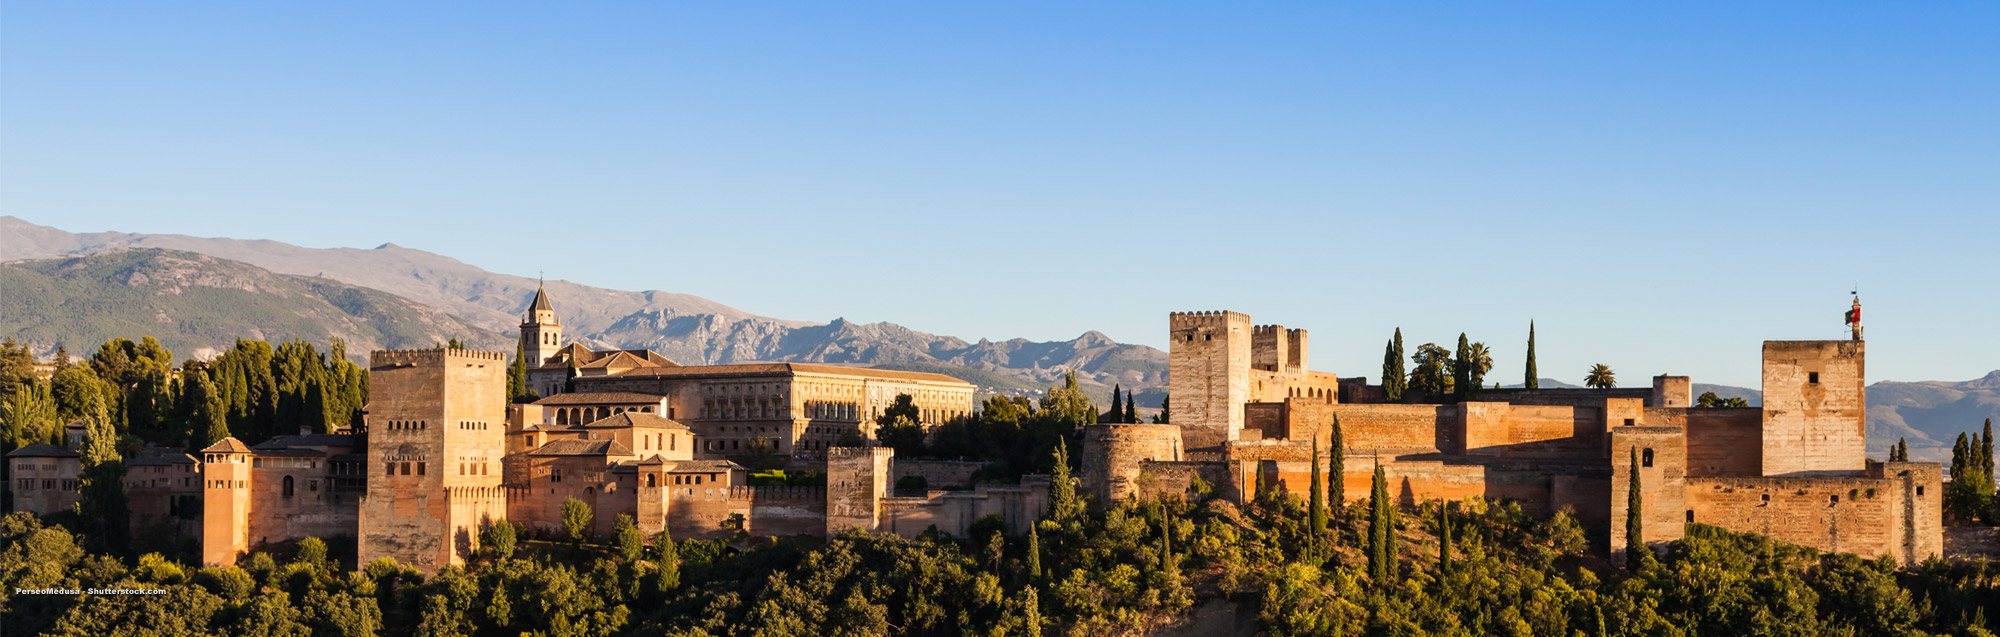 Sprachschulen in Granada